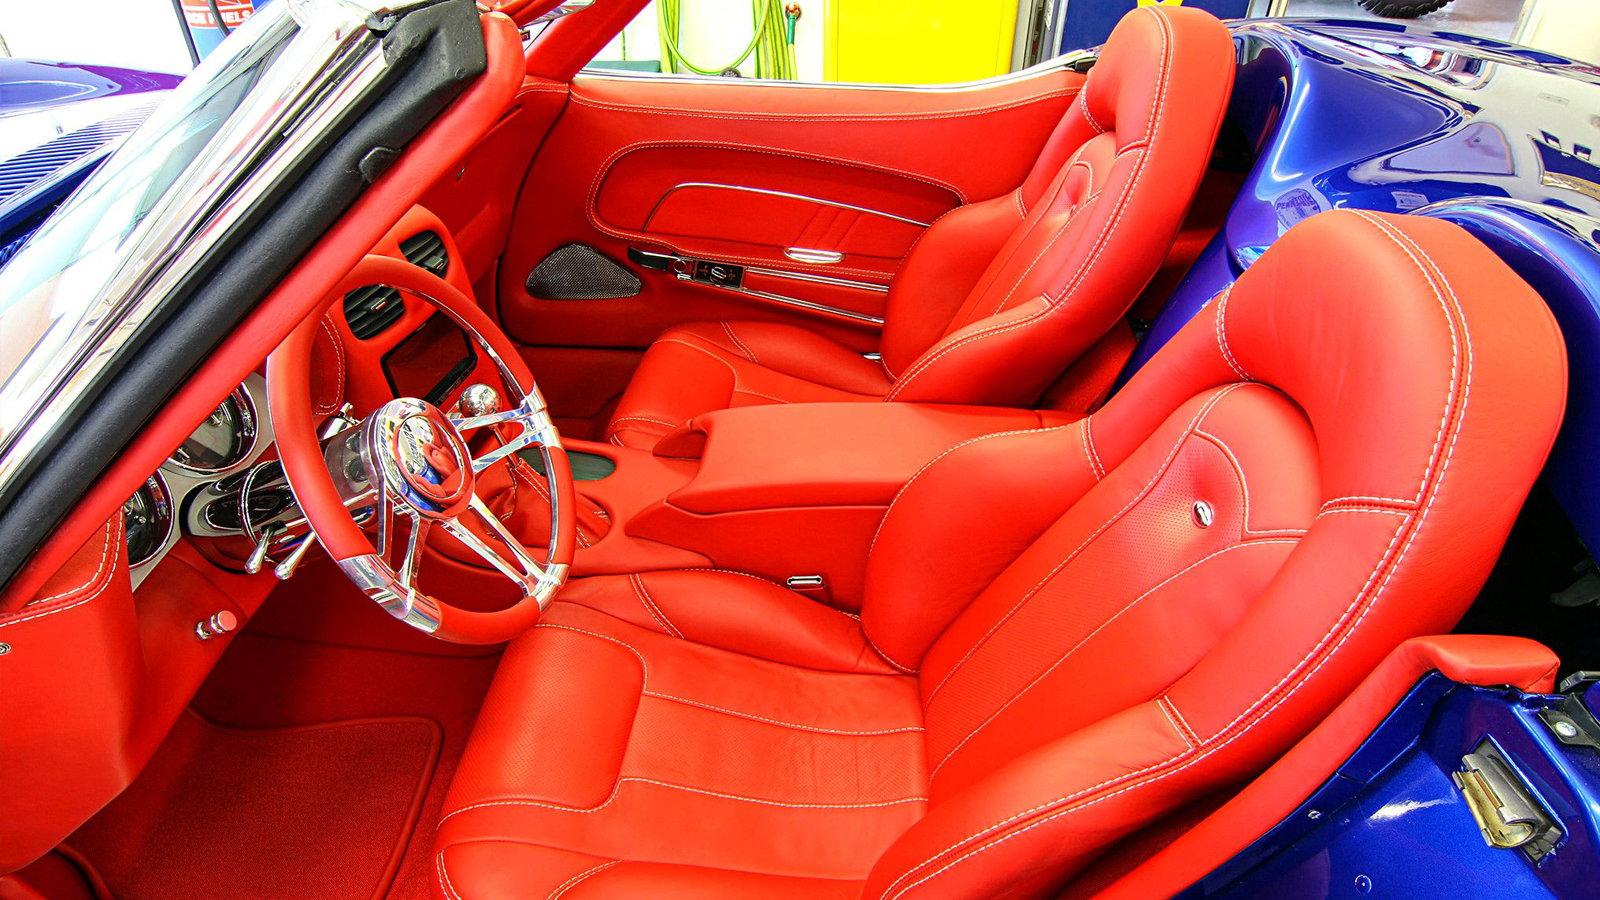 525HP 1972 Corvette Has a Peculiar Story